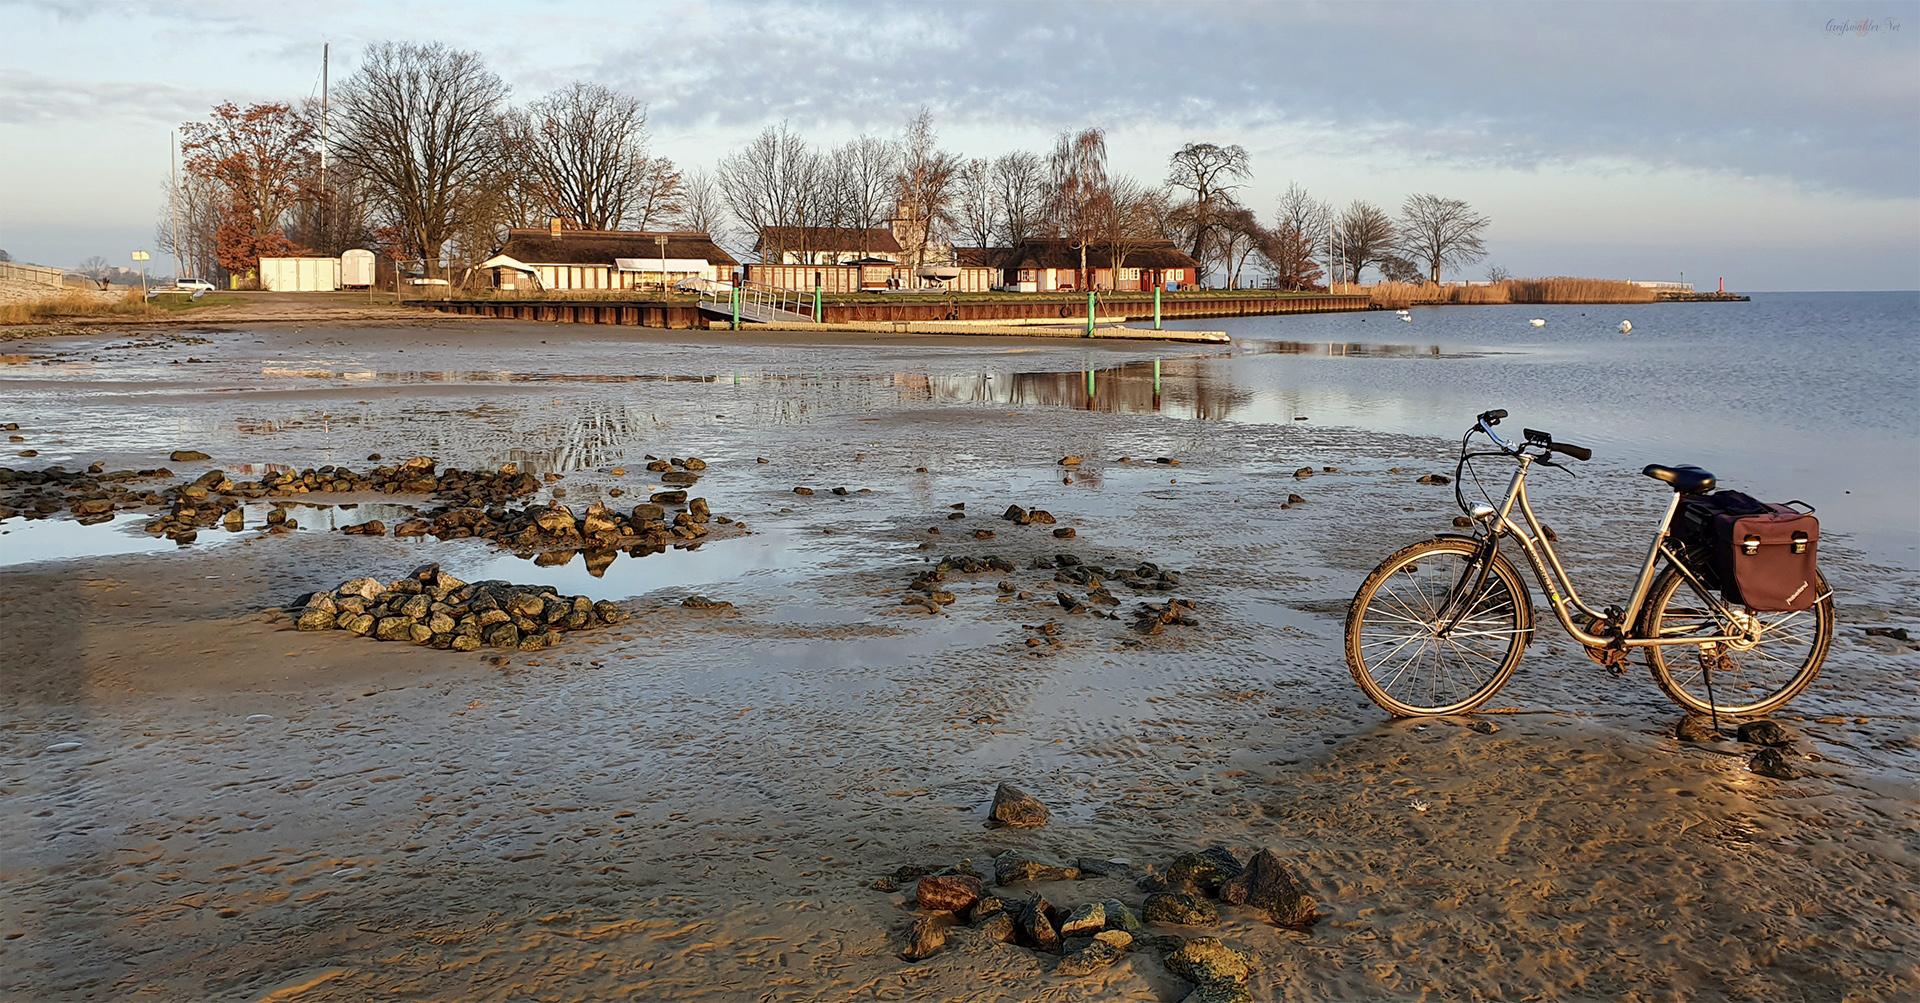 Niedrigwasser am Strand in Greifswald-Eldena